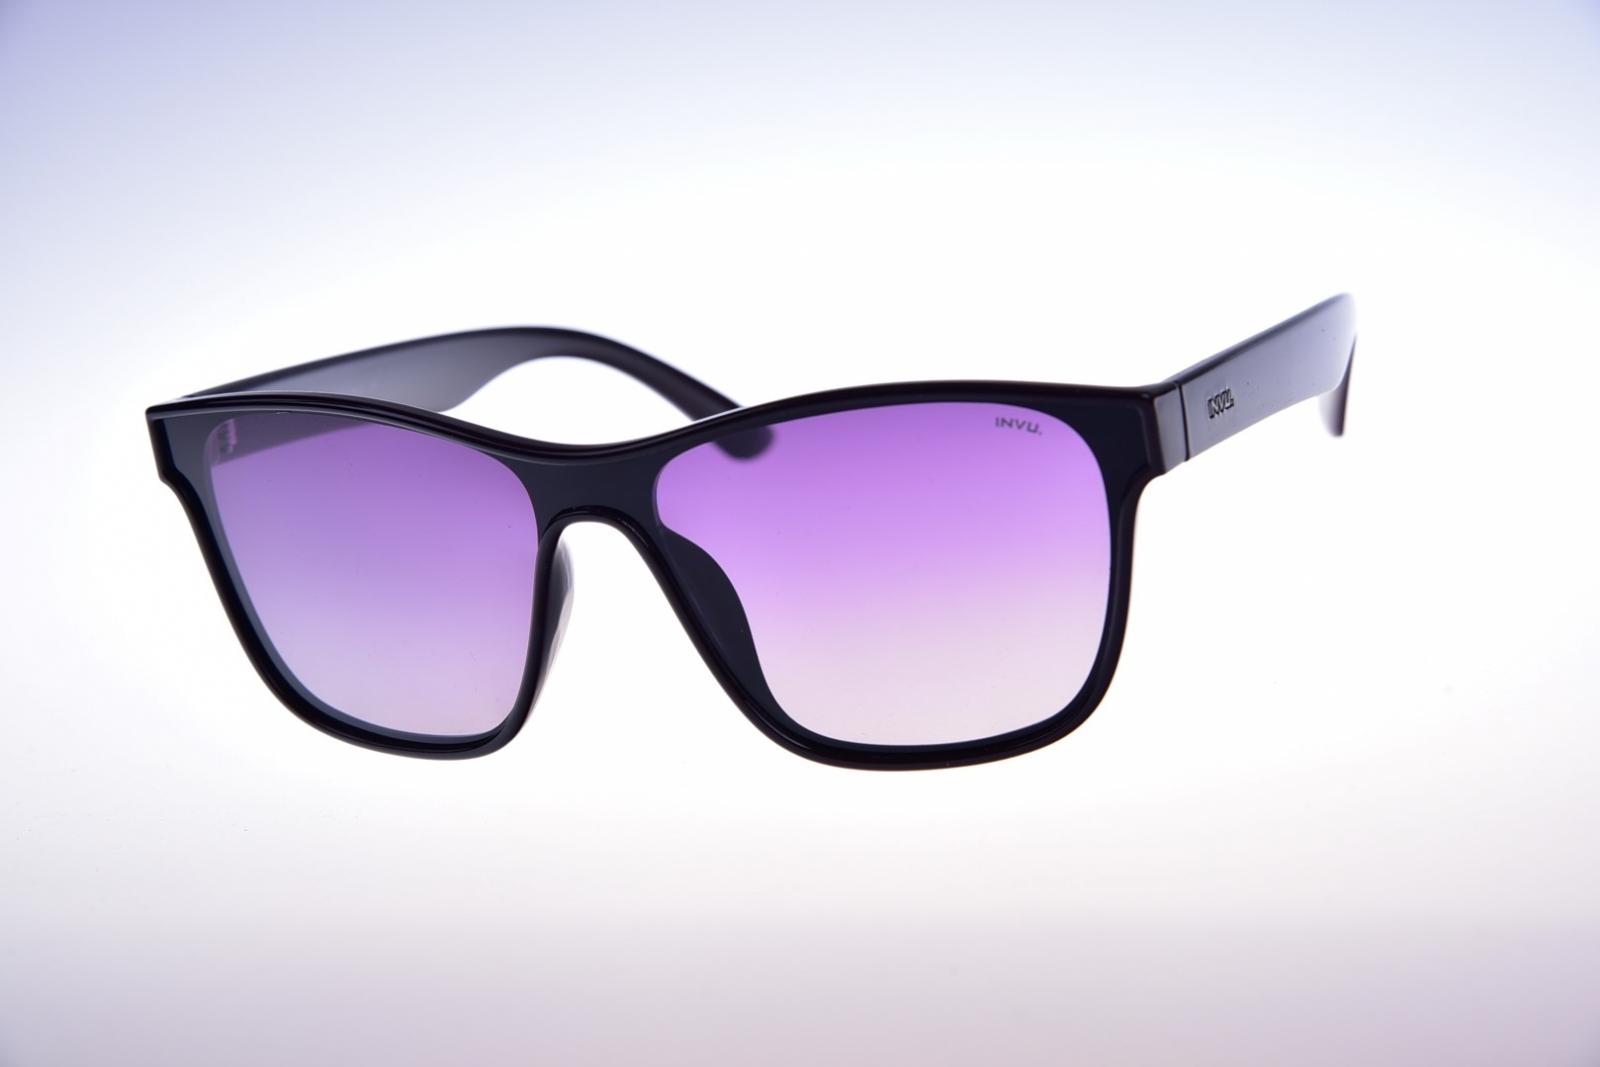 944c8f5f0 INVU. Trend T2710B - Dámske, pánske a detské slnečné okuliare ...